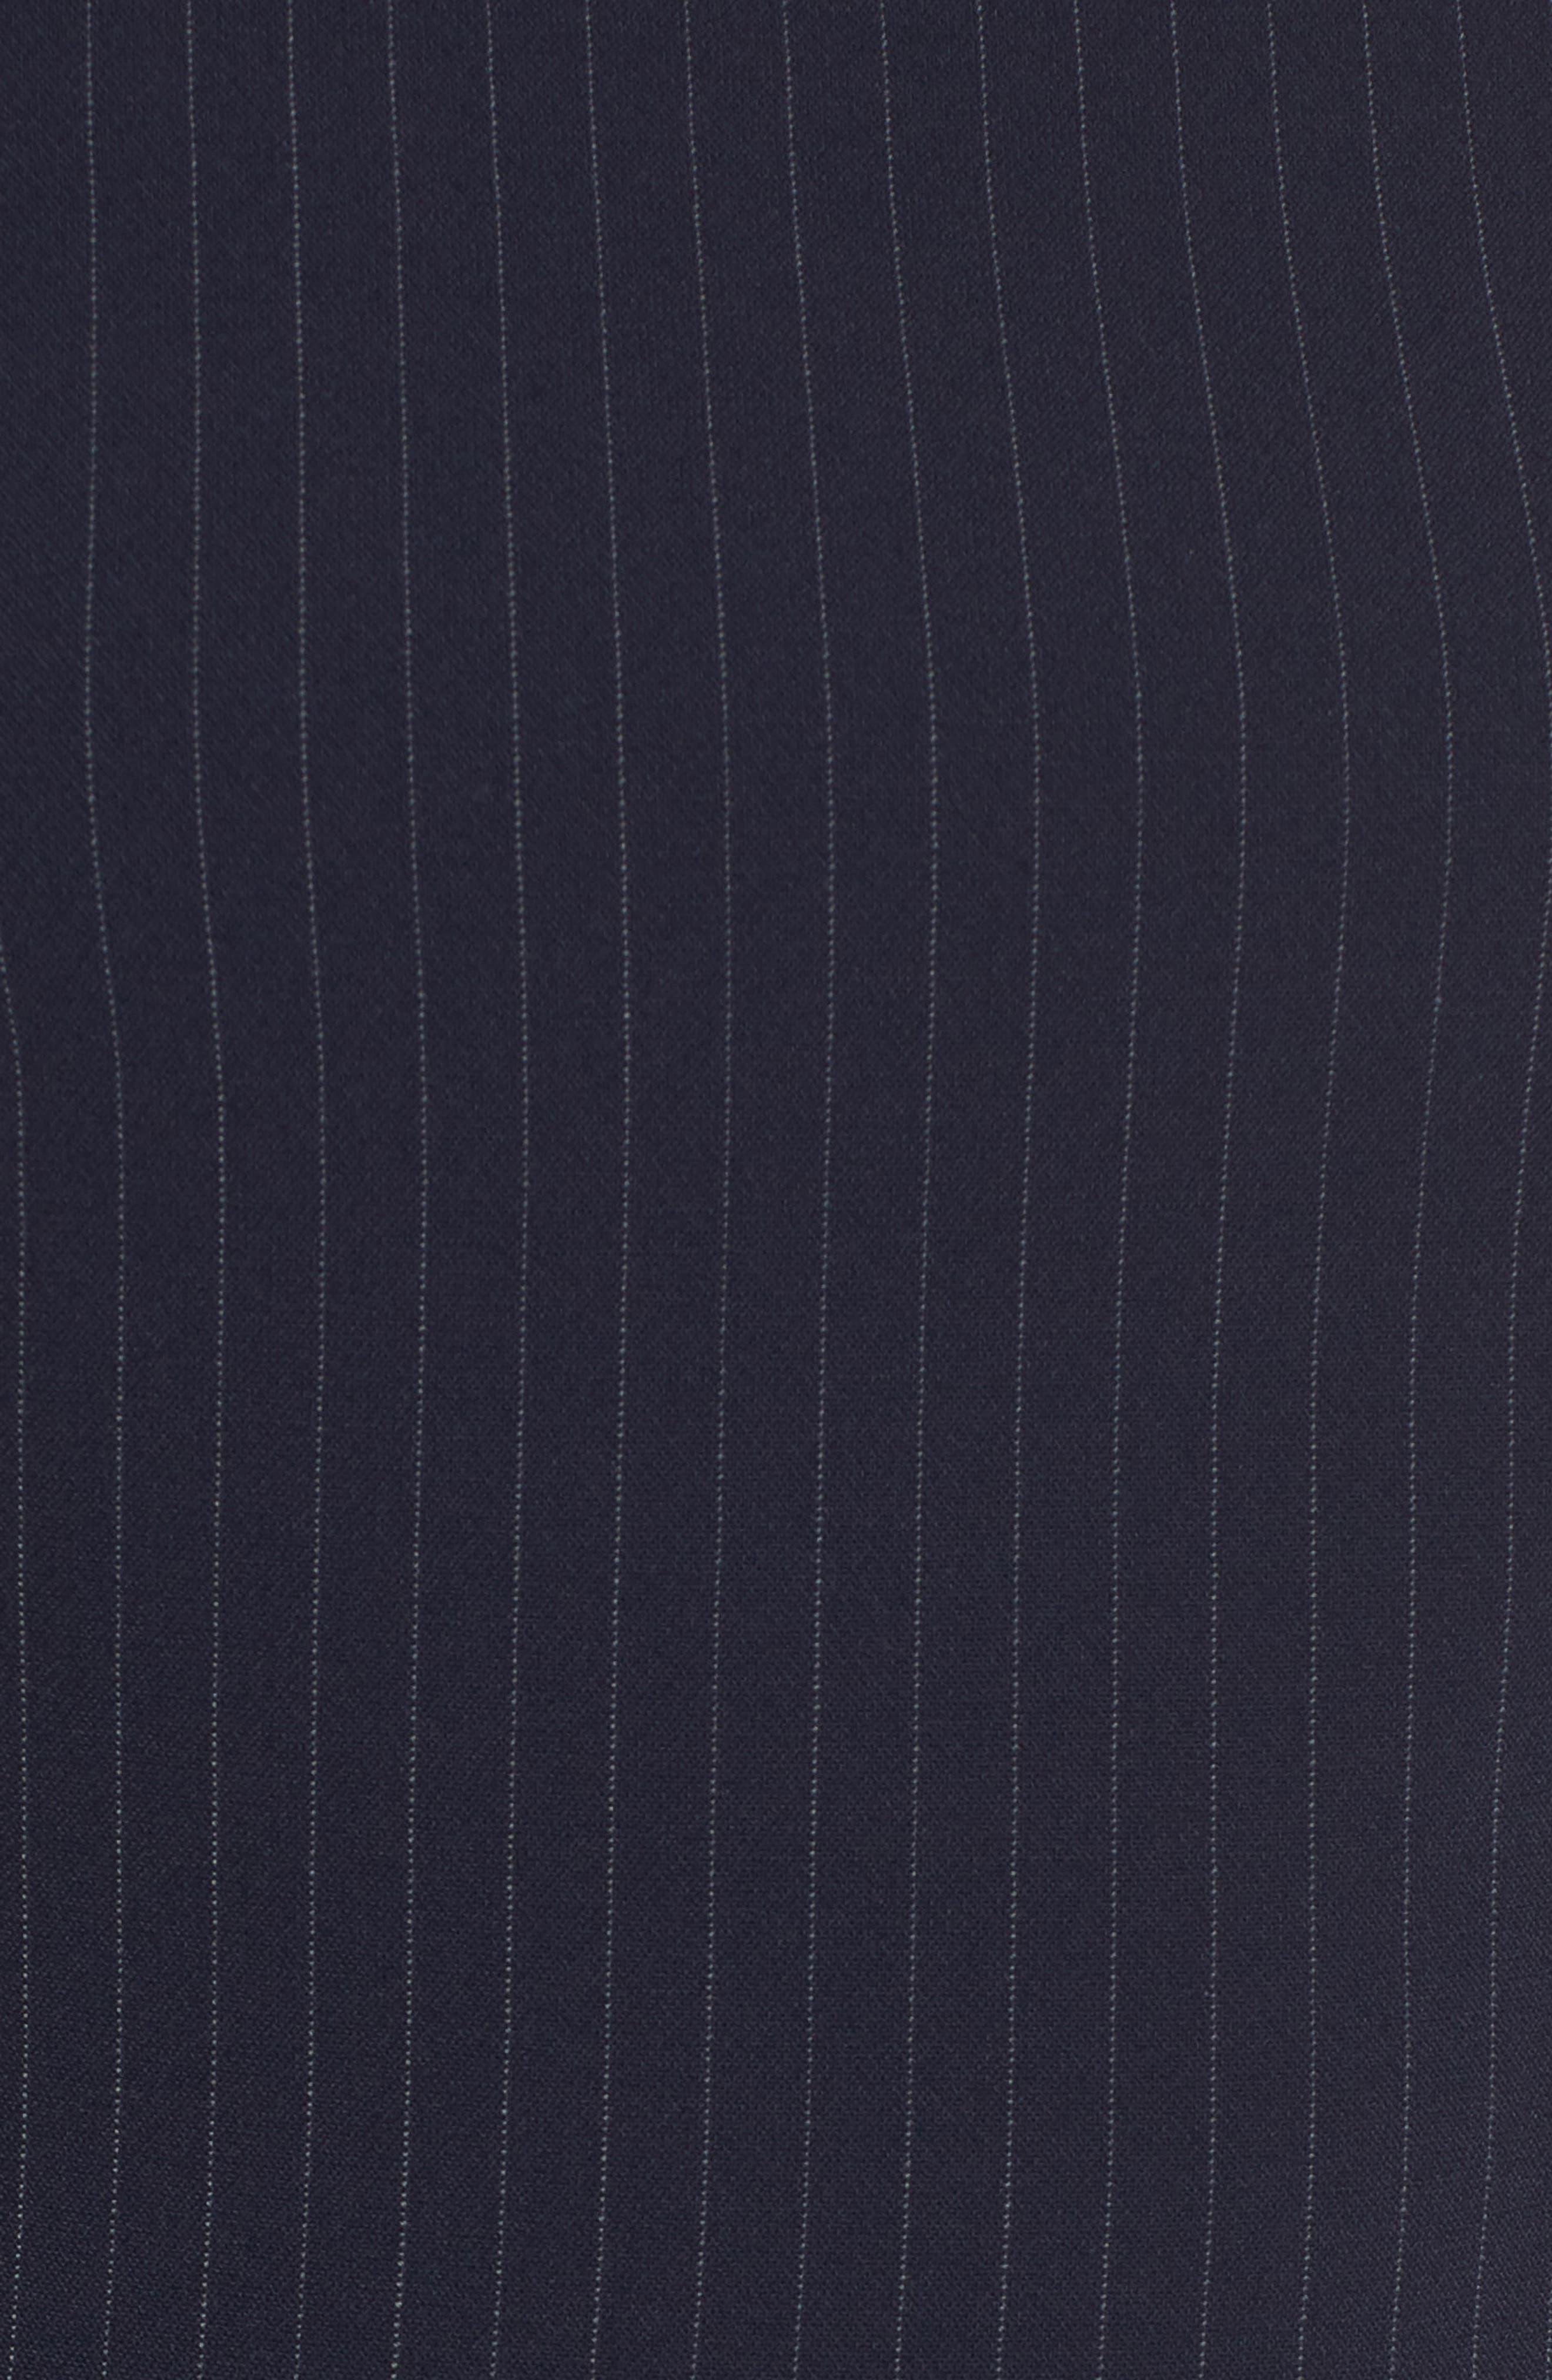 Denaka Pinstripe Sheath Dress,                             Alternate thumbnail 5, color,                             462